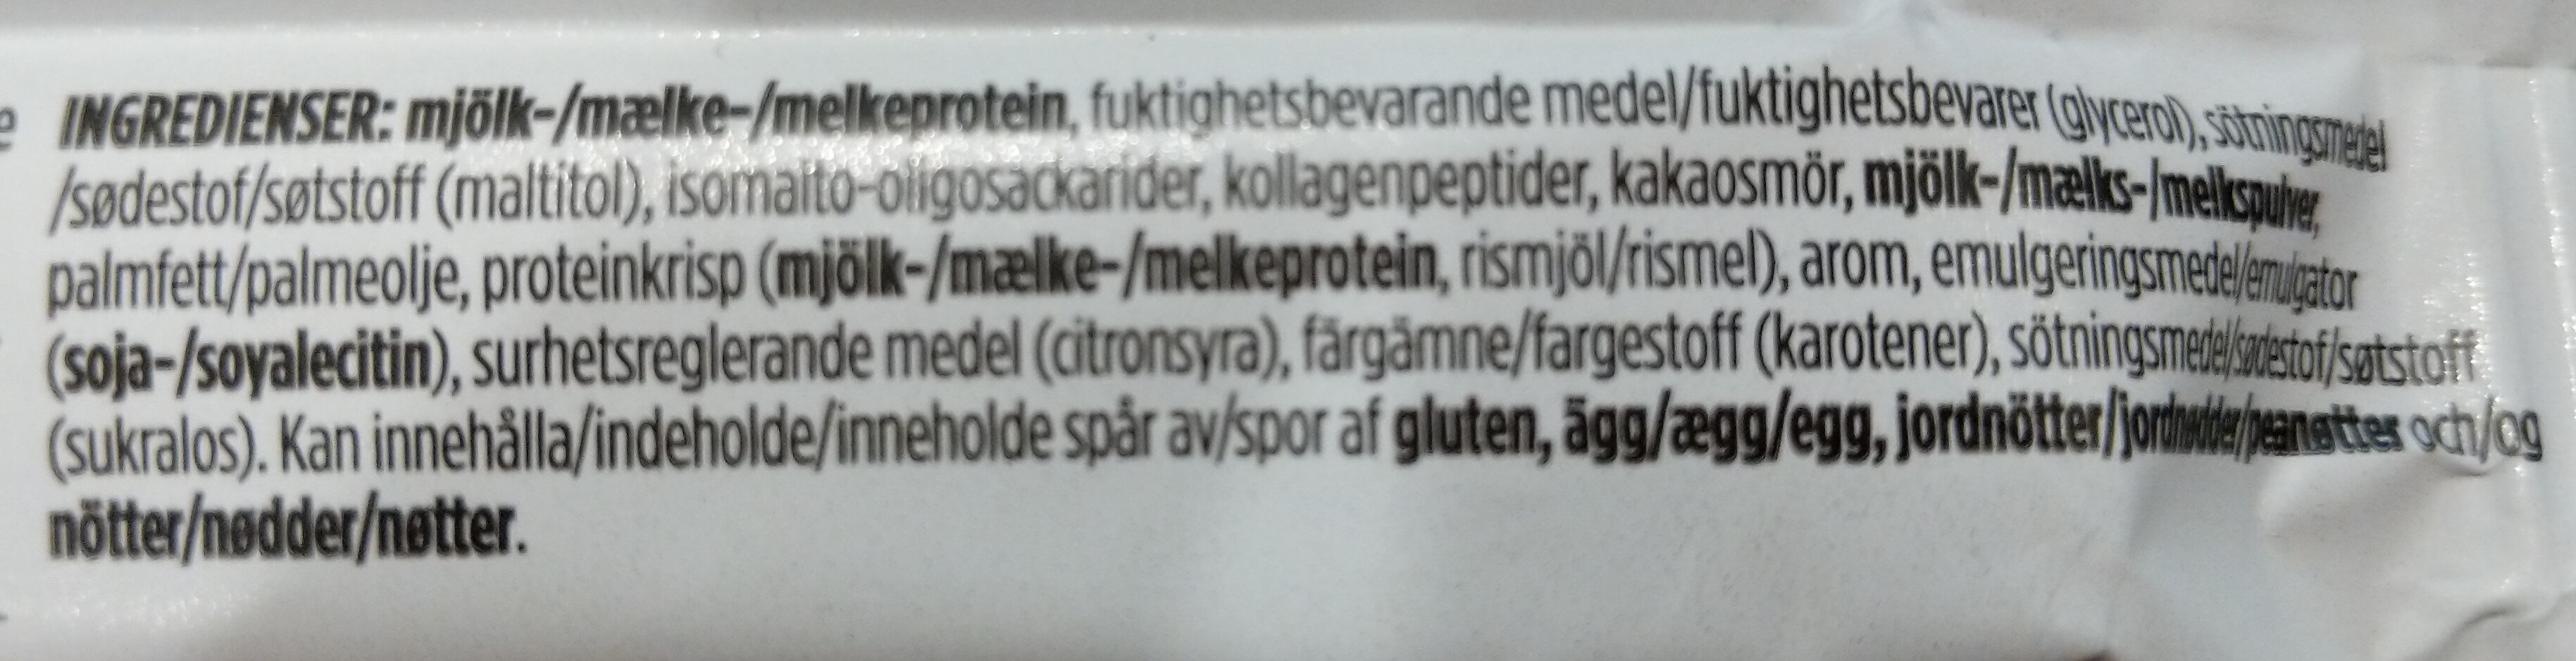 Lemon Curd White Chocolate - Ingrédients - sv